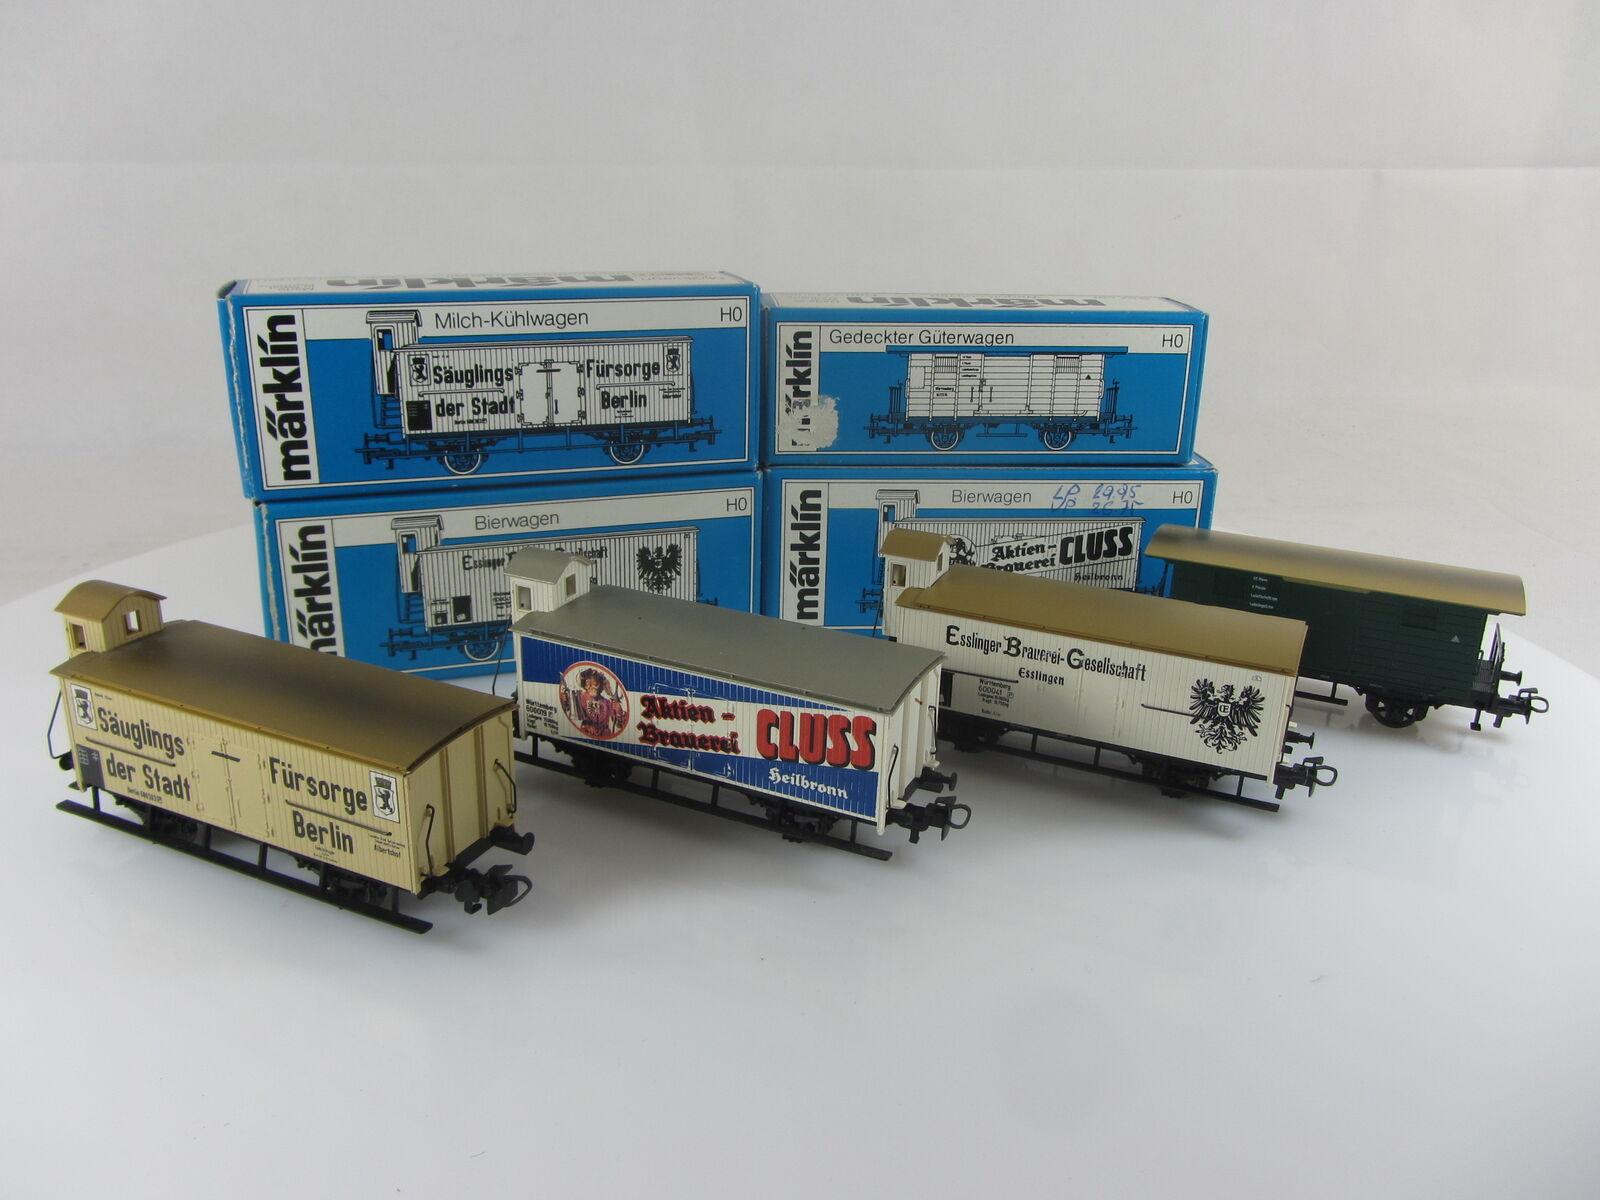 Märklin 4780,4781,4782 carro della birra g10 e 4685 carri merci Wurtenberg, Gebr. M OVP